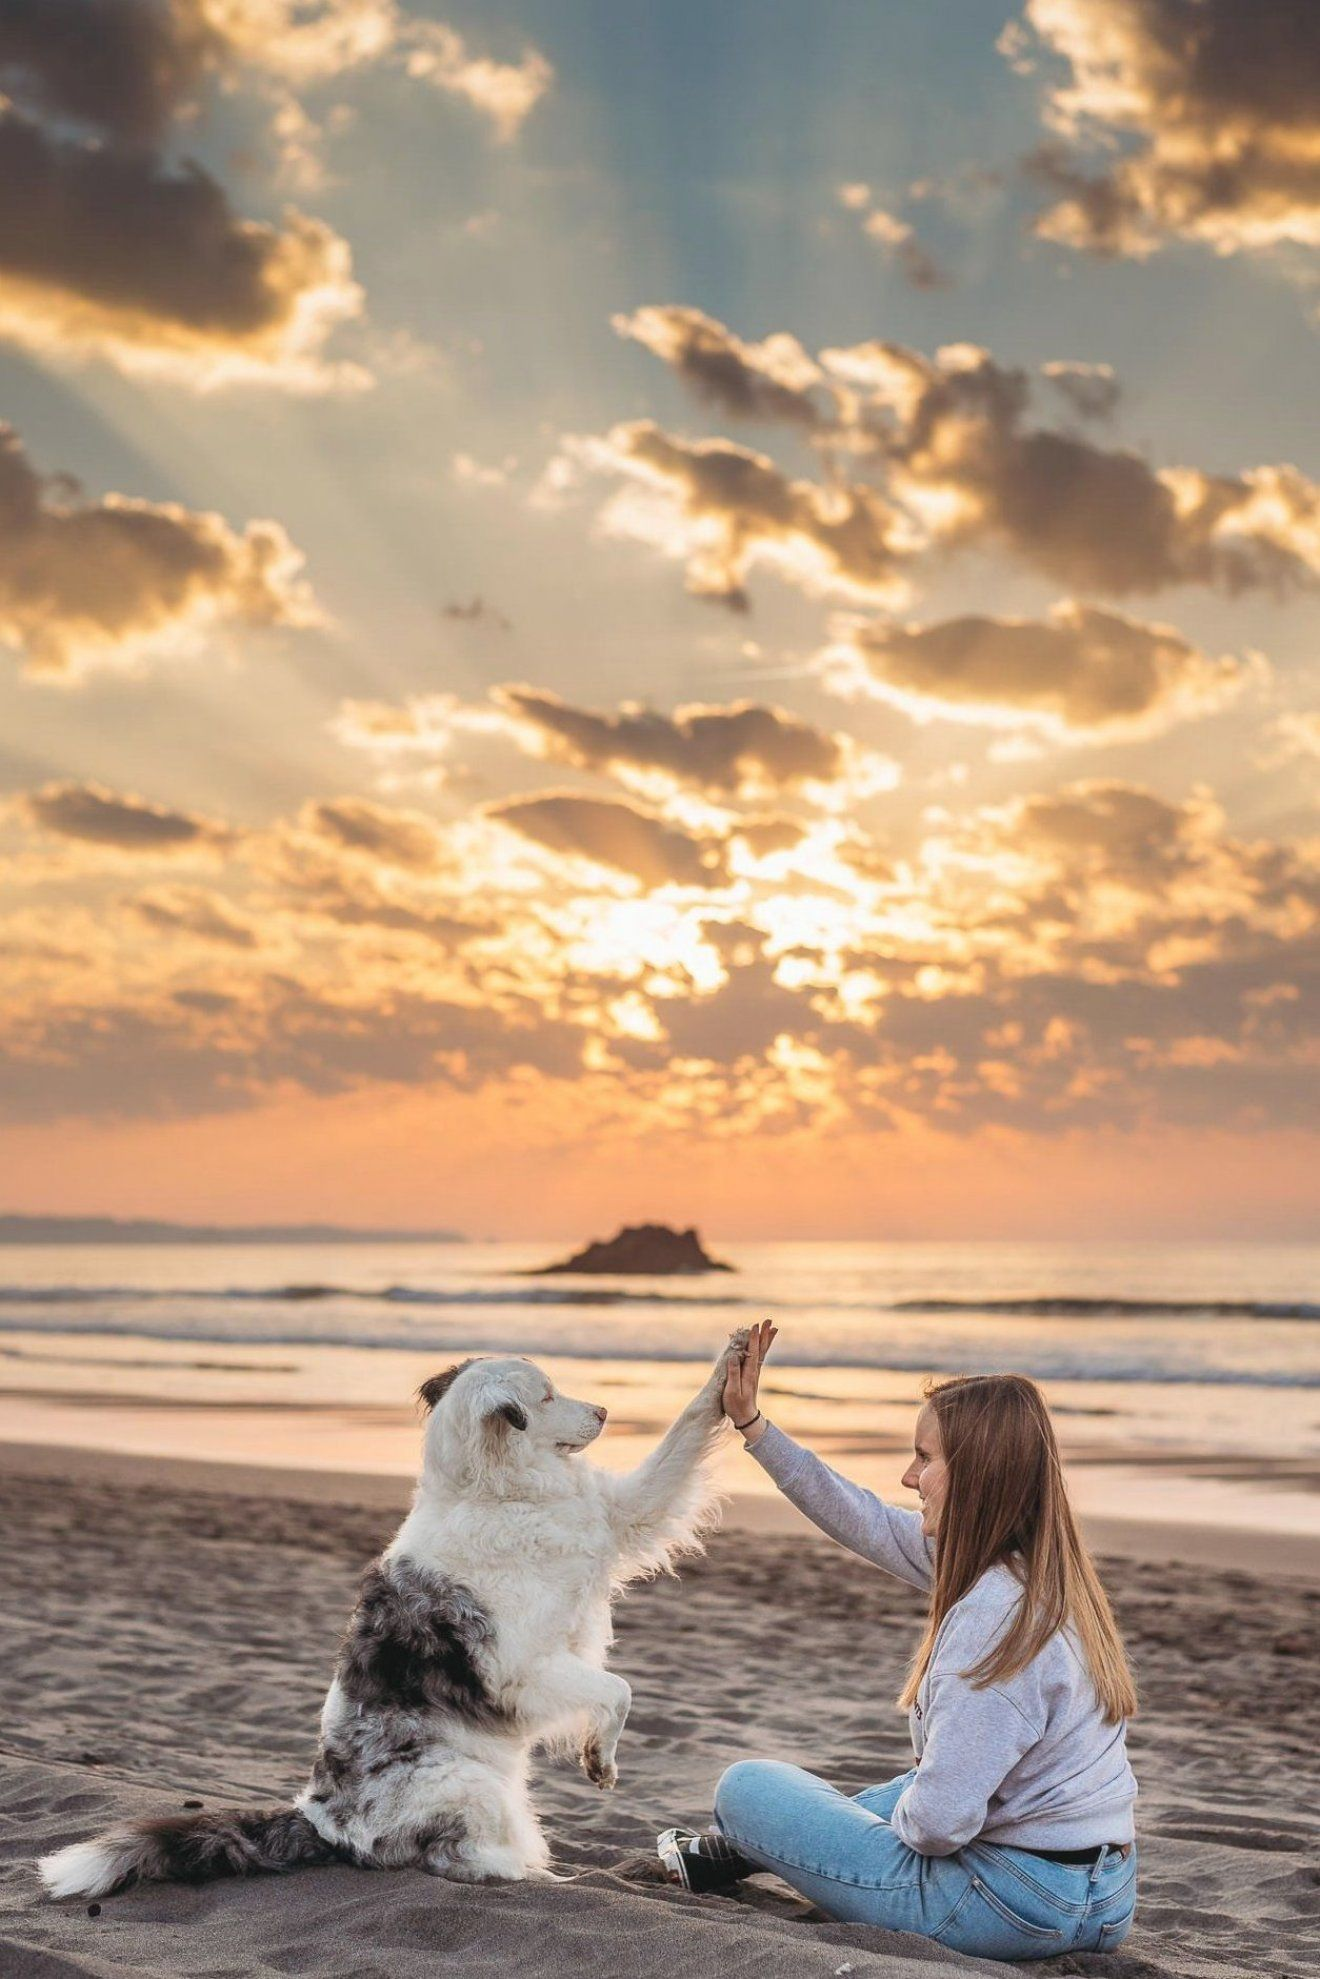 Fotos de pareja con perro en la playa   Elena S  Mu  oz Fotograf  a   Sesi  n de fotos de pareja con su mascota   Oviedo  Gij  n  Avil  s  Asturias  Santander  Cantabria